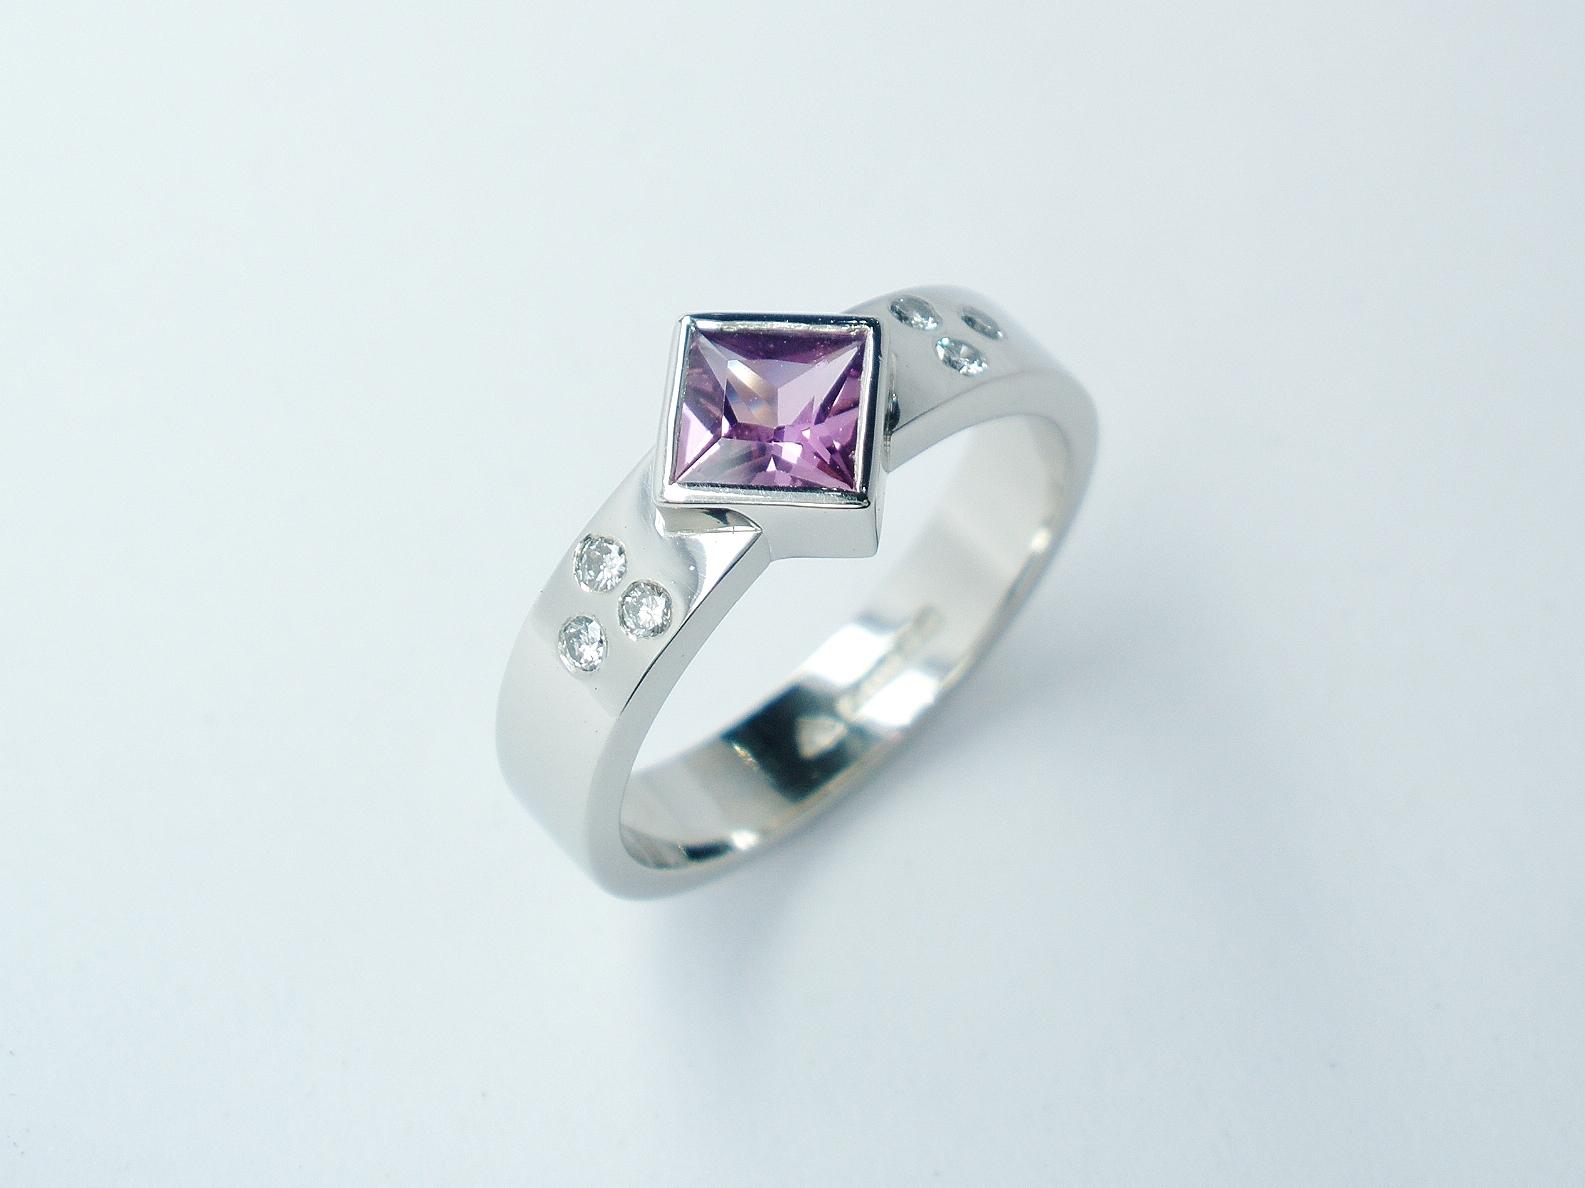 Square princess cut rub-over set purple sapphire and flush set diamond ring mounted in palladium.